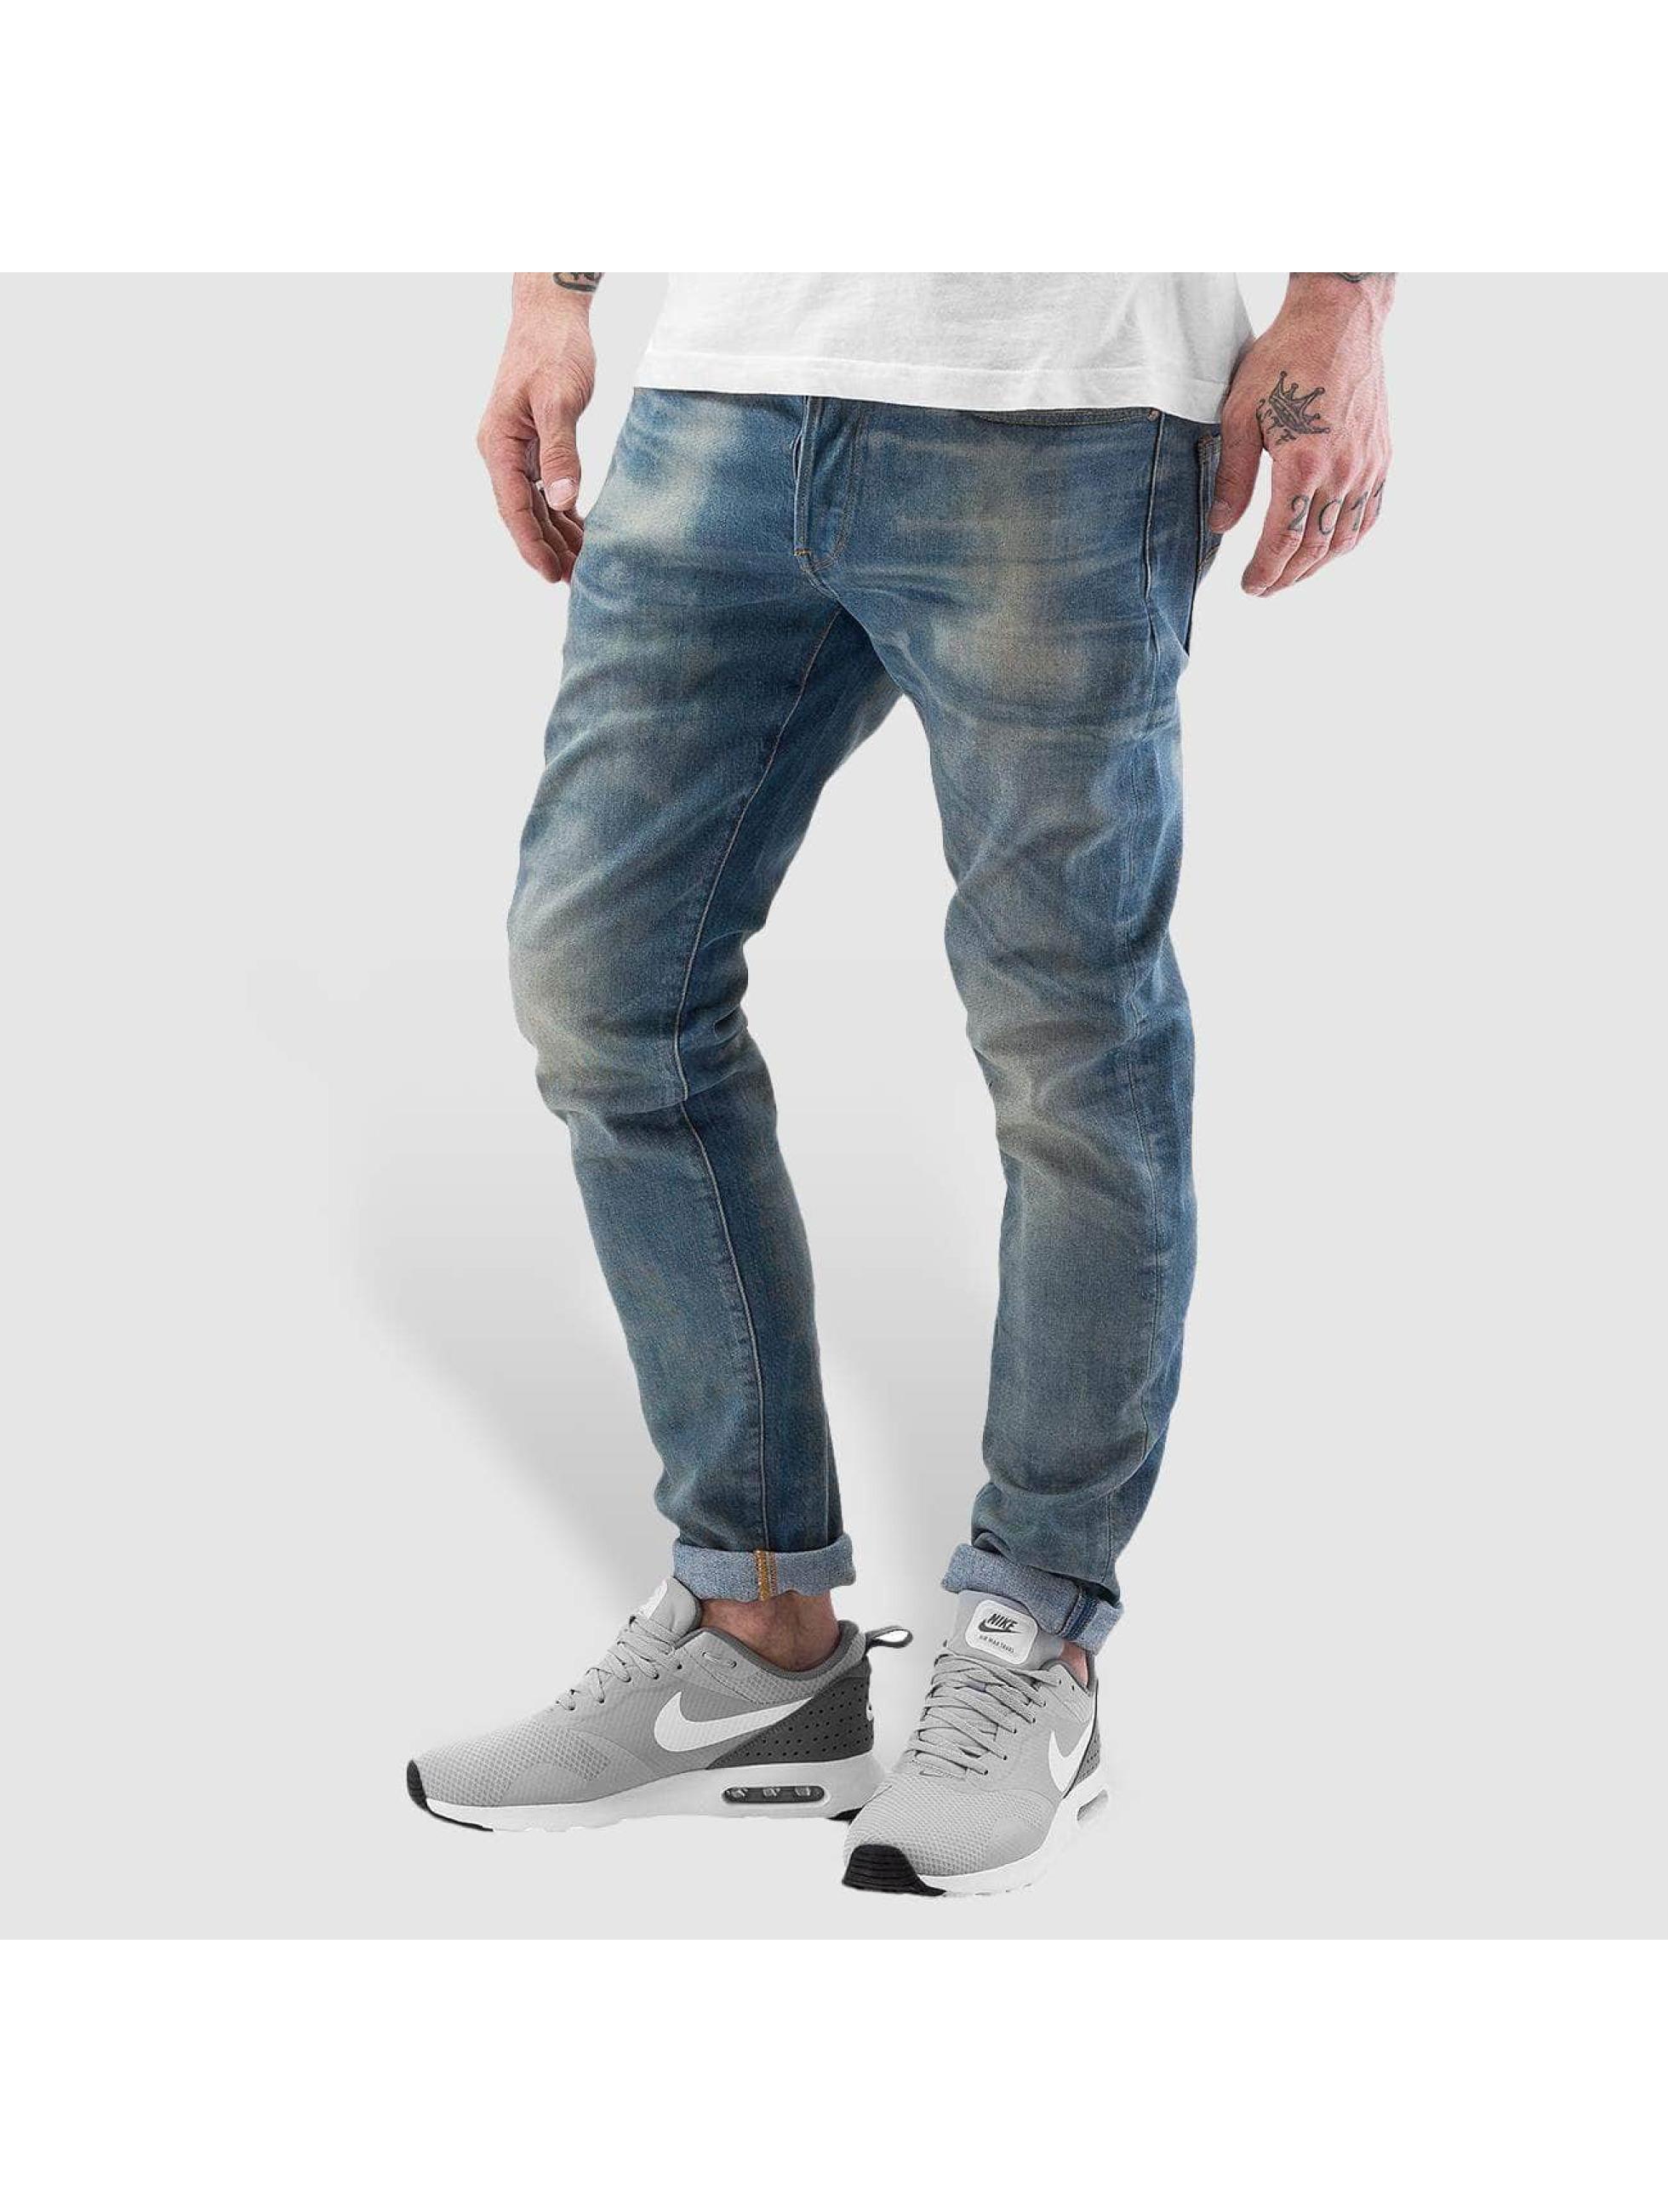 Skinny Jeans 3301 in blau